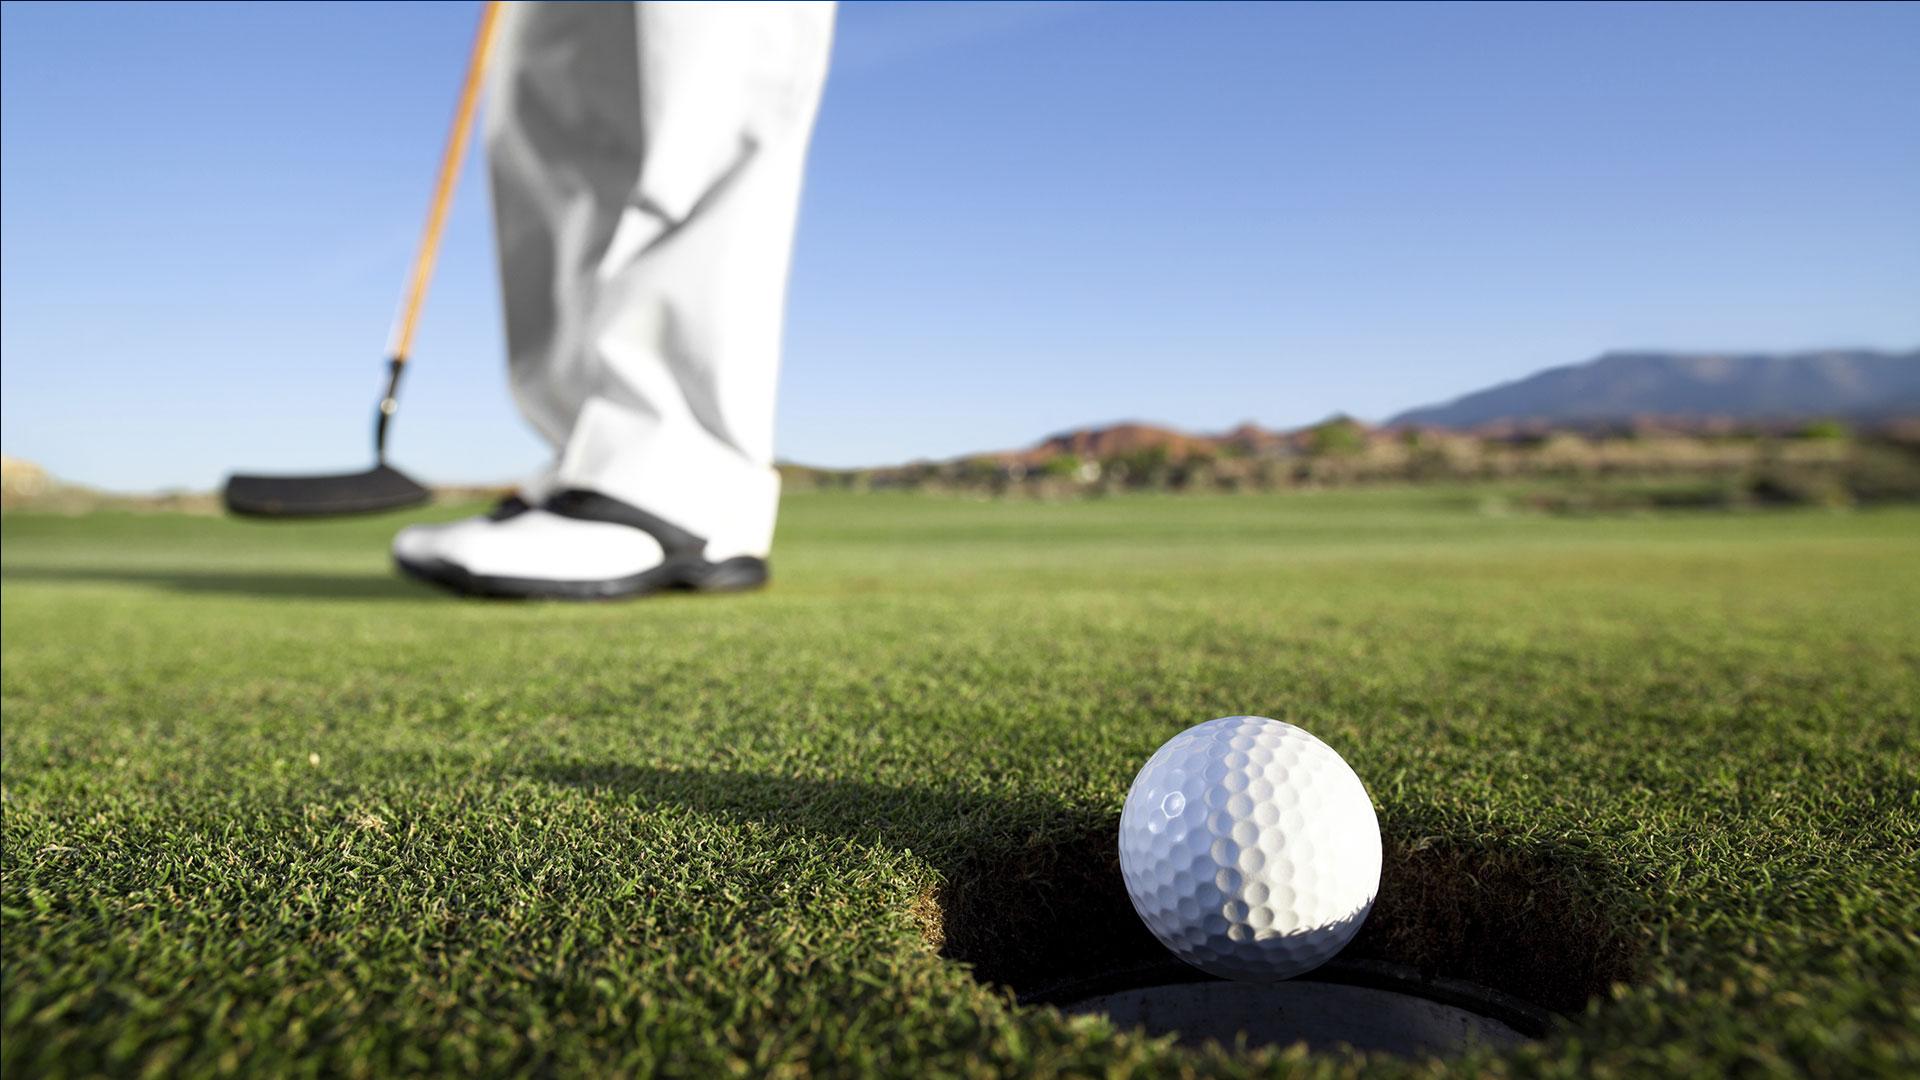 KELO-sports-generic-golf-2_1529437983812.jpg